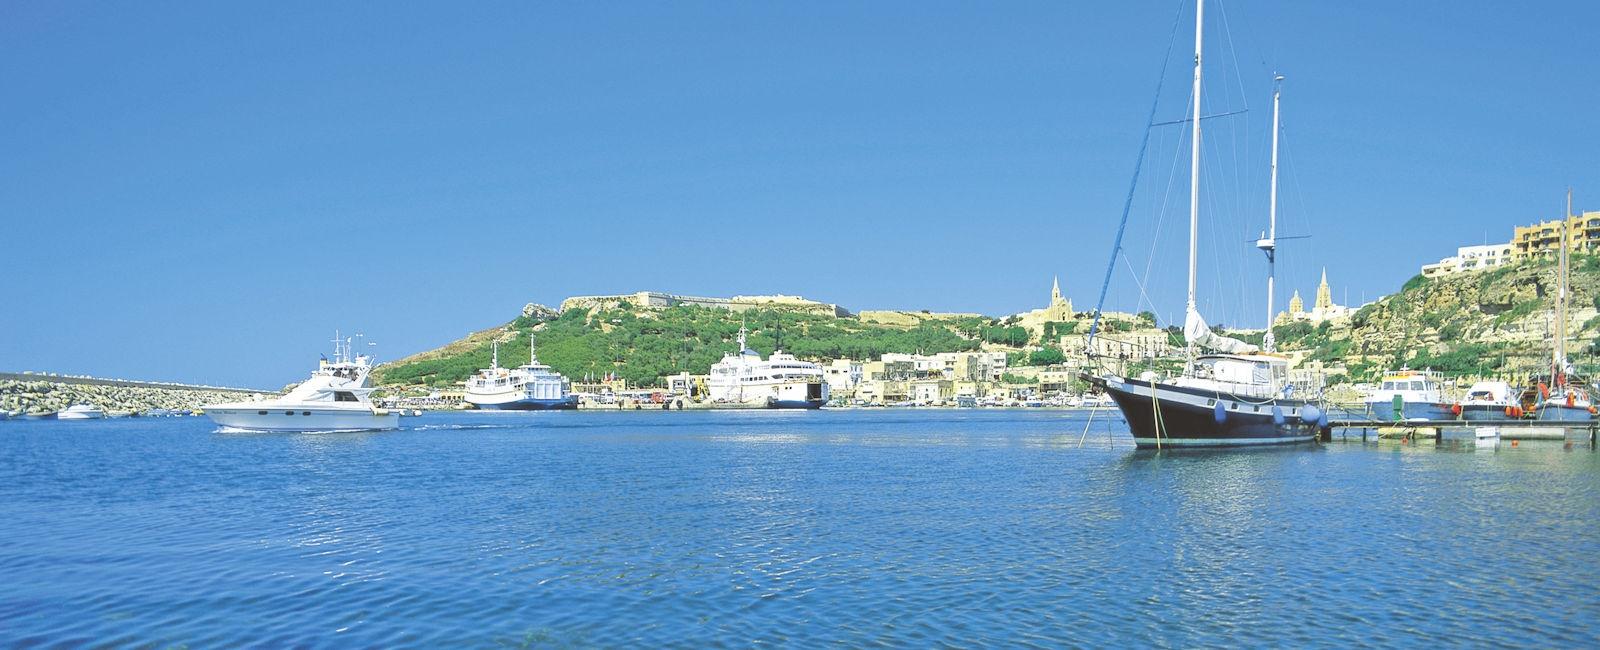 Malta sea image